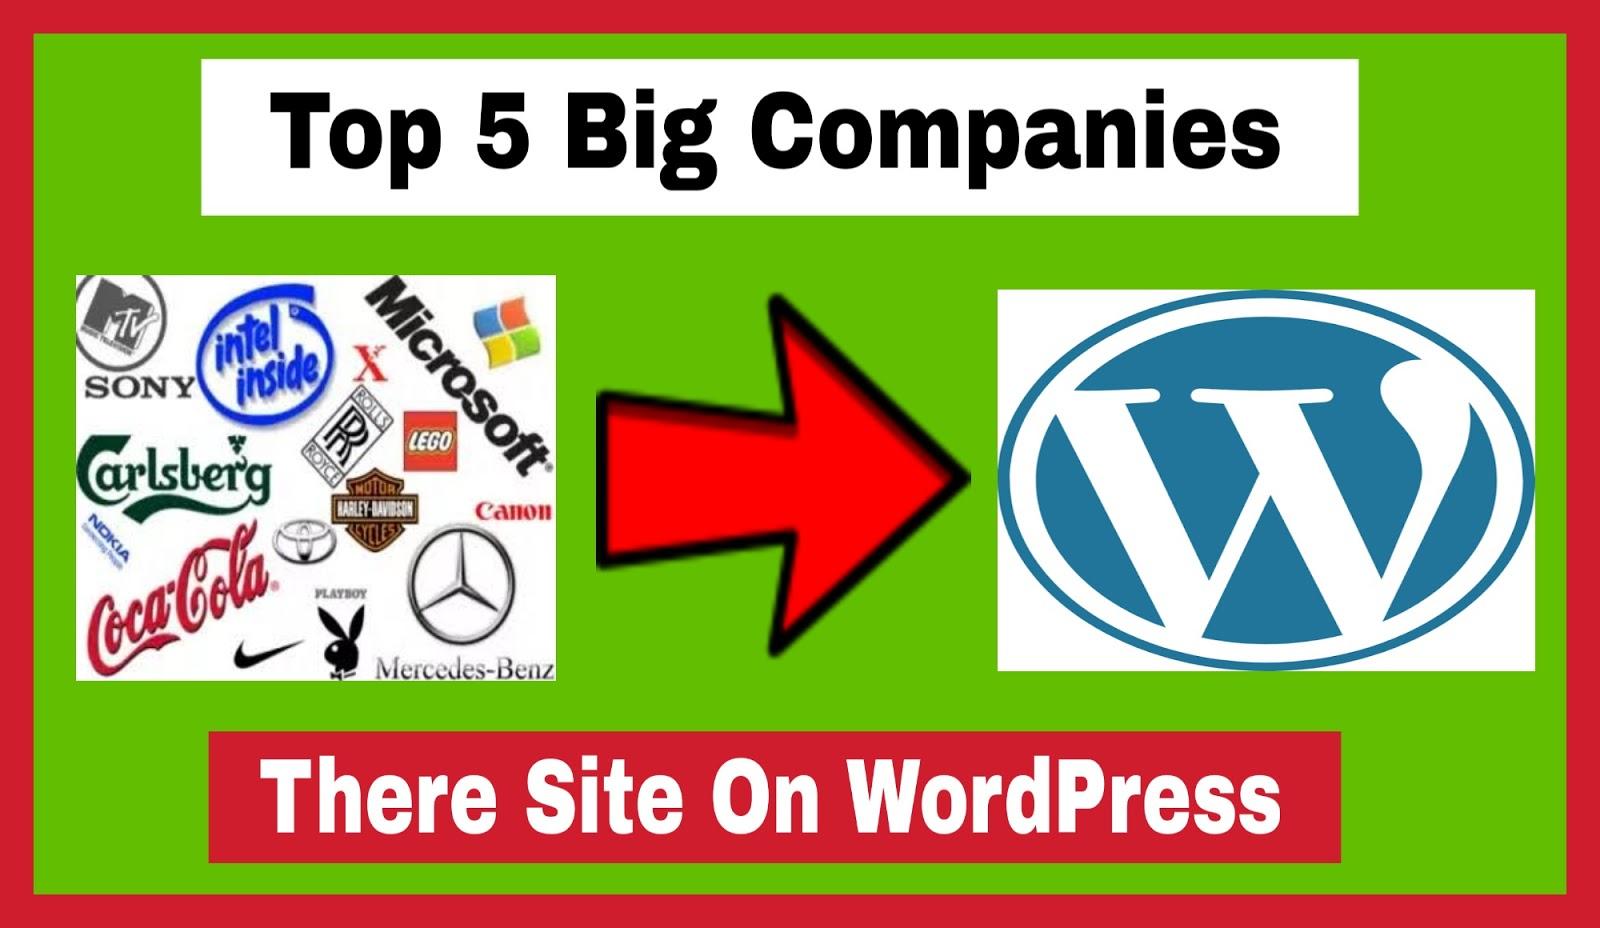 Top 5 Big Company There Site On Wordpress